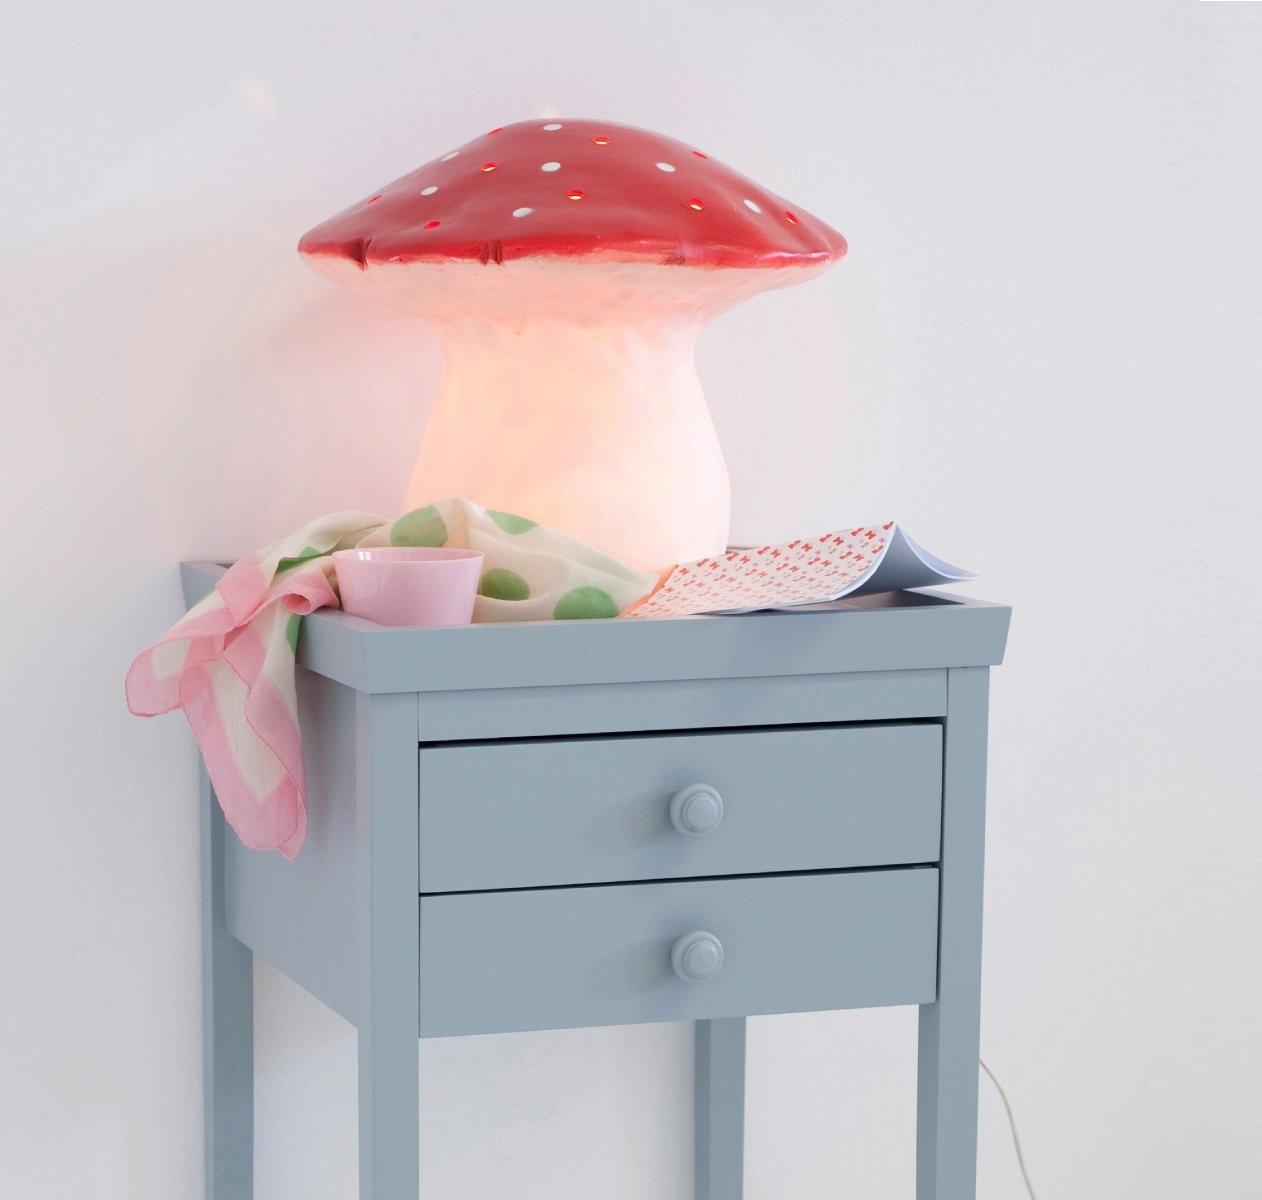 lampe touch champignon simple lampe sensitive touch lampe tactile intensitacs lampe sensitive. Black Bedroom Furniture Sets. Home Design Ideas